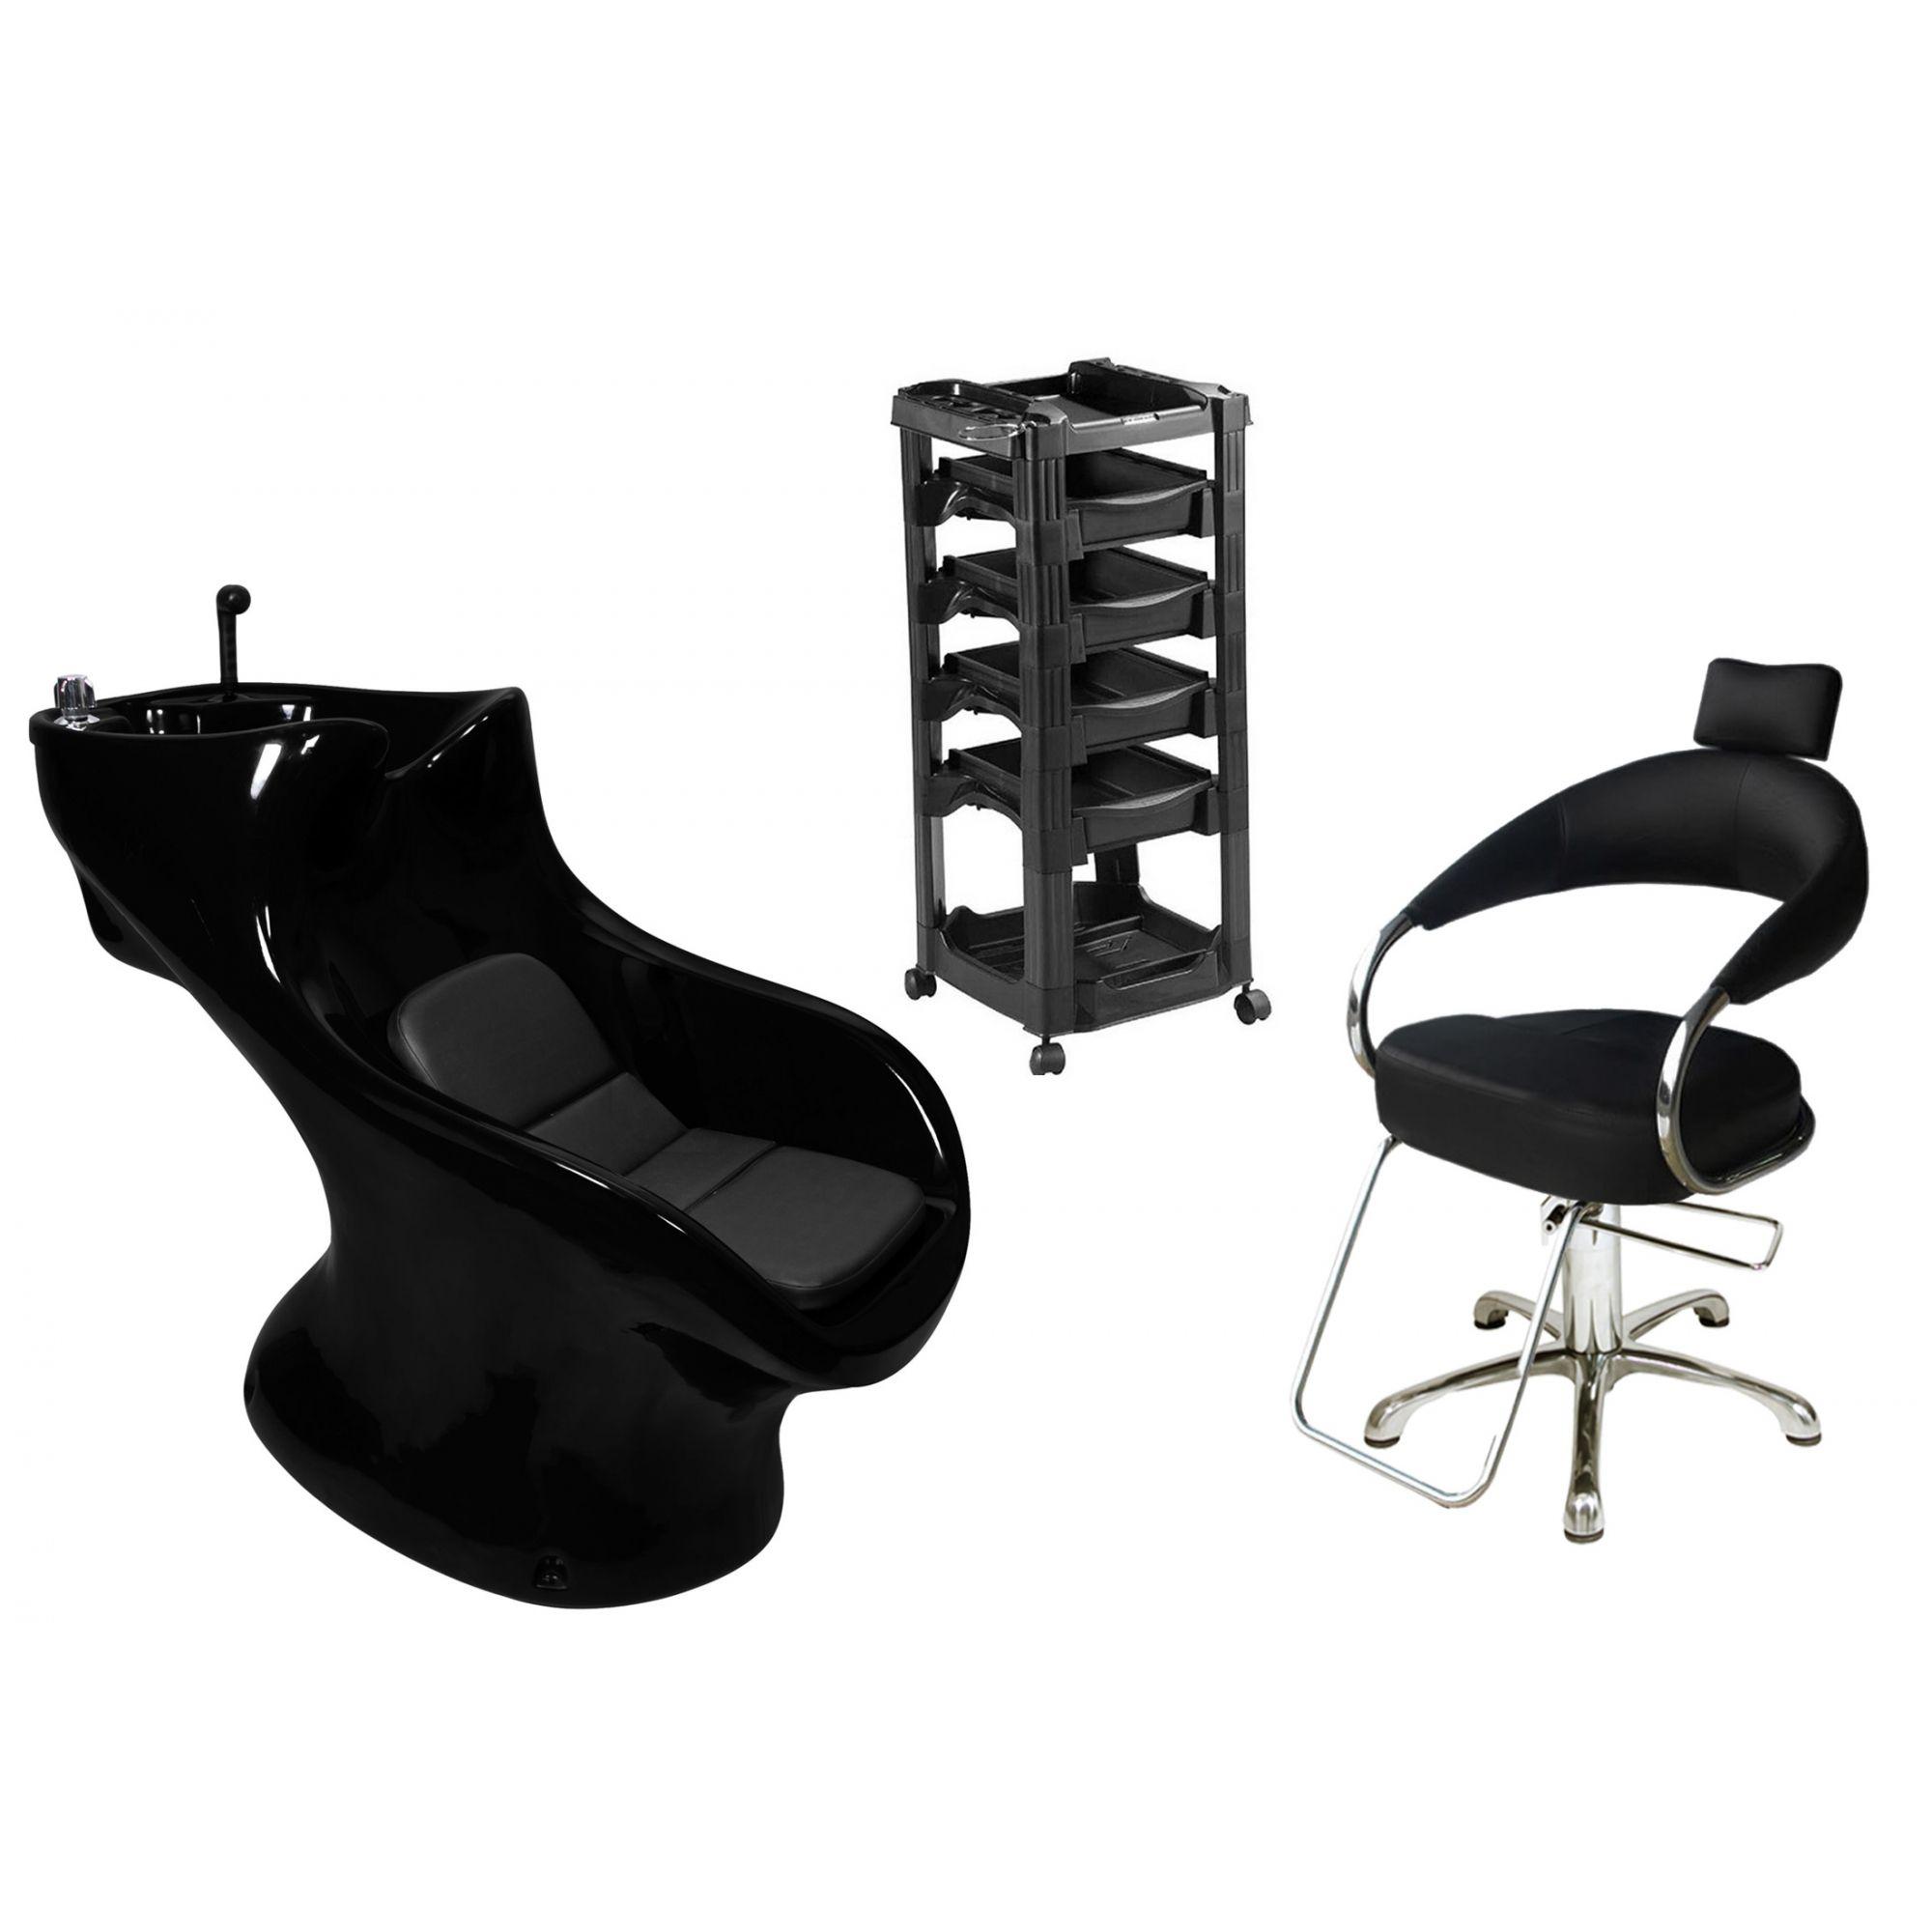 Lavatório Star Italiano + Cadeira Hidráulica Futurama + Vegas